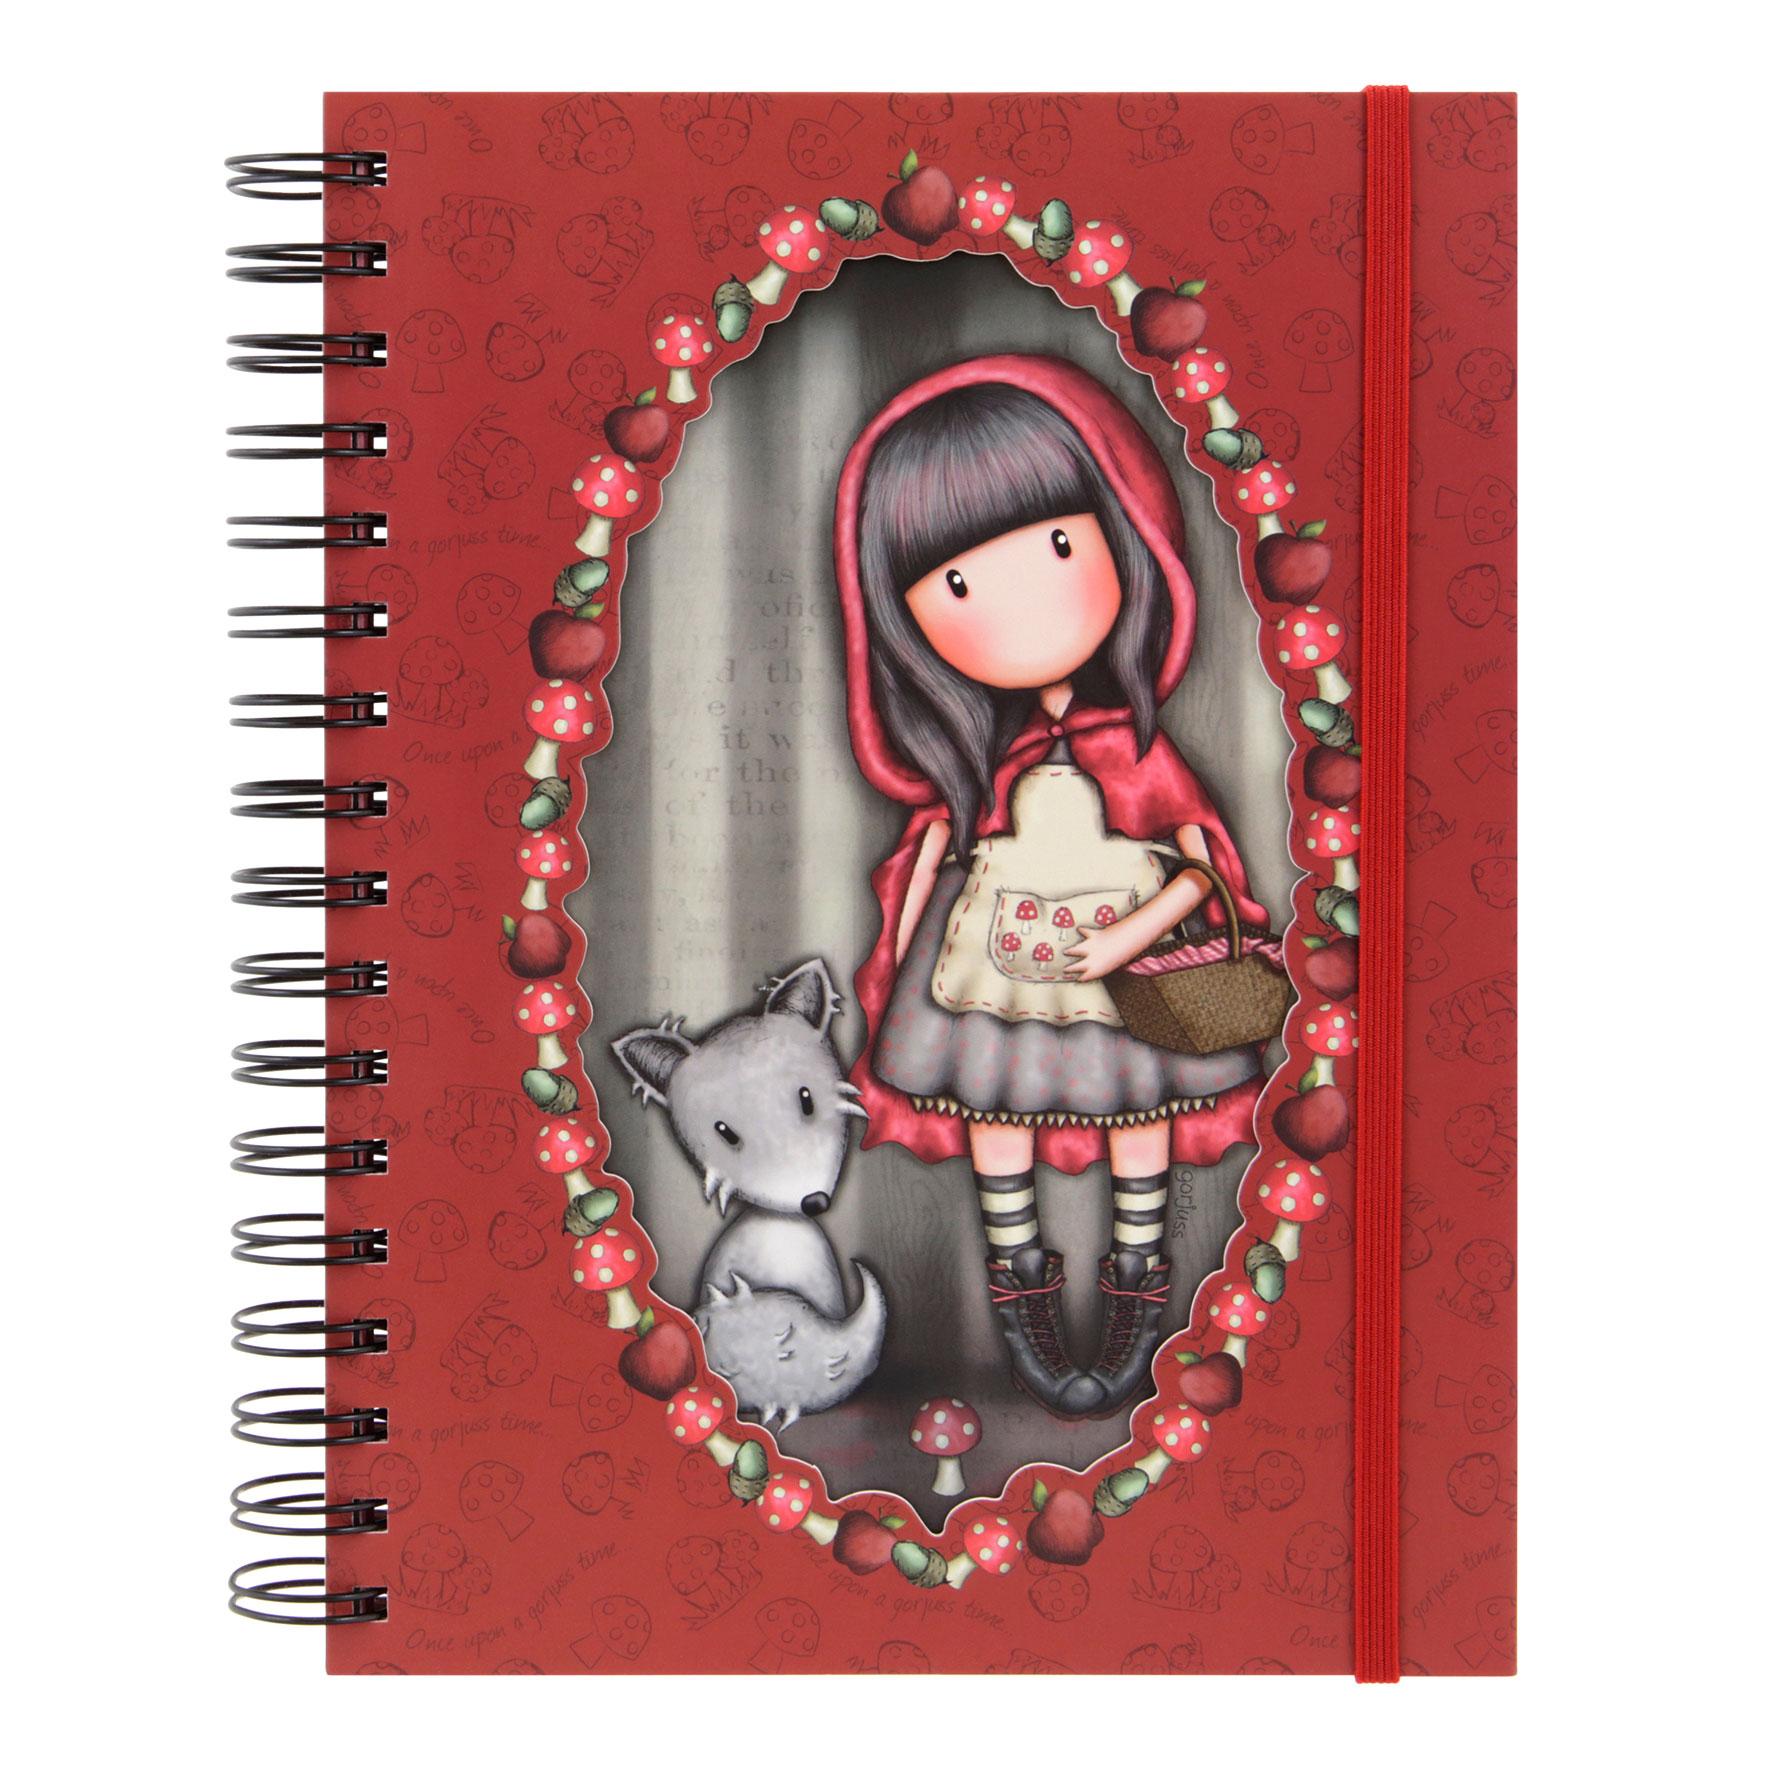 Купить Блокнот большой - Little Red Riding Hood, Santoro London